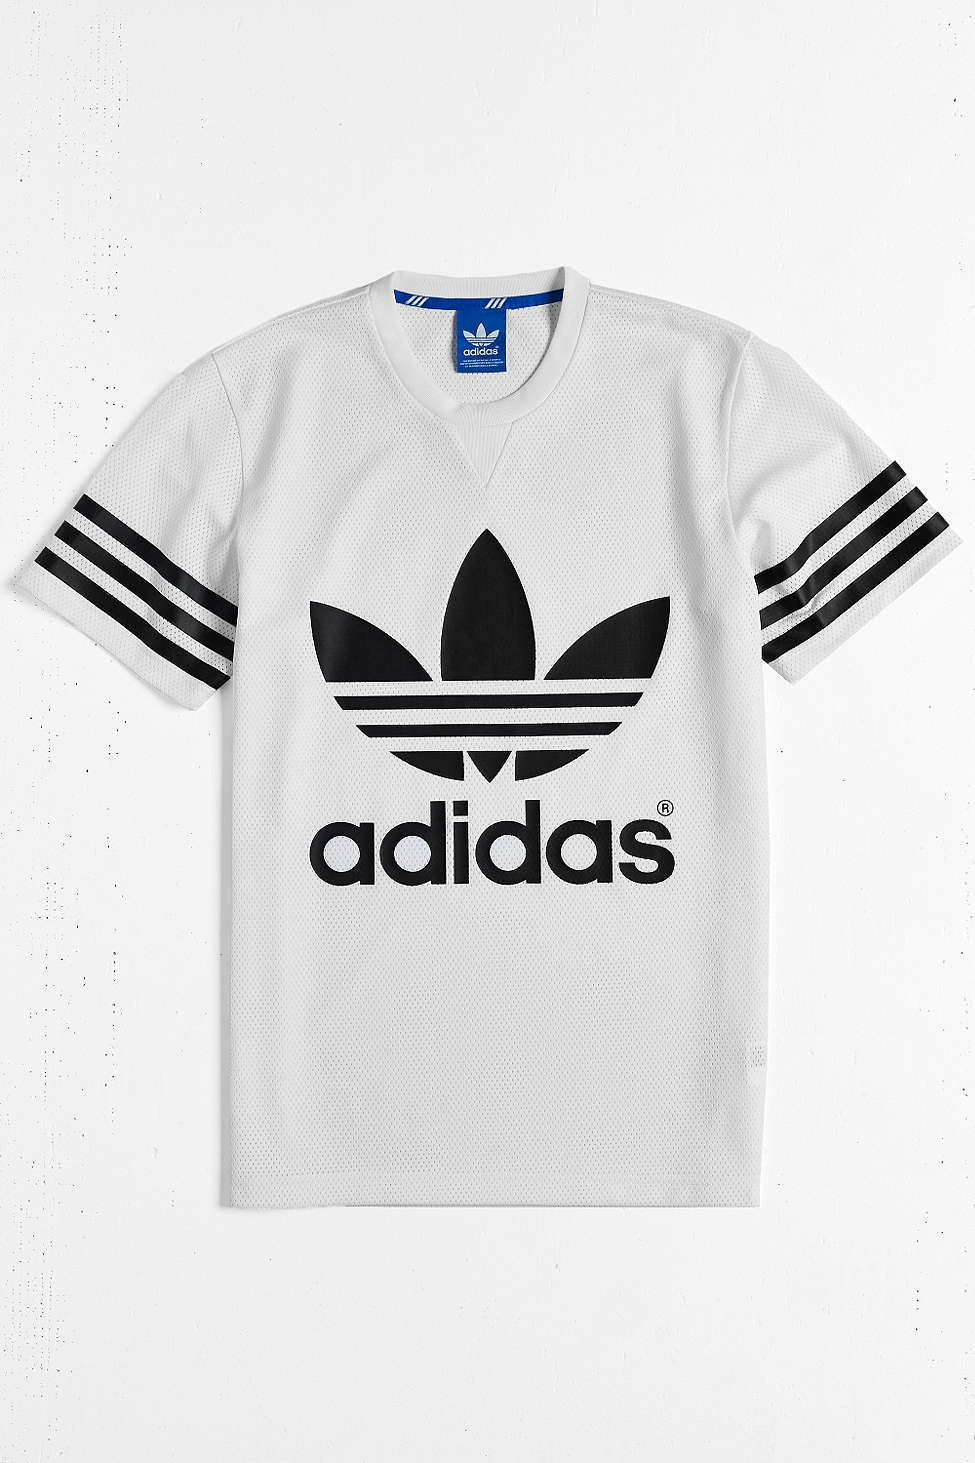 TeeExpresión Poleras Originals Mesh In 2019 Adidas lKTF1cJ